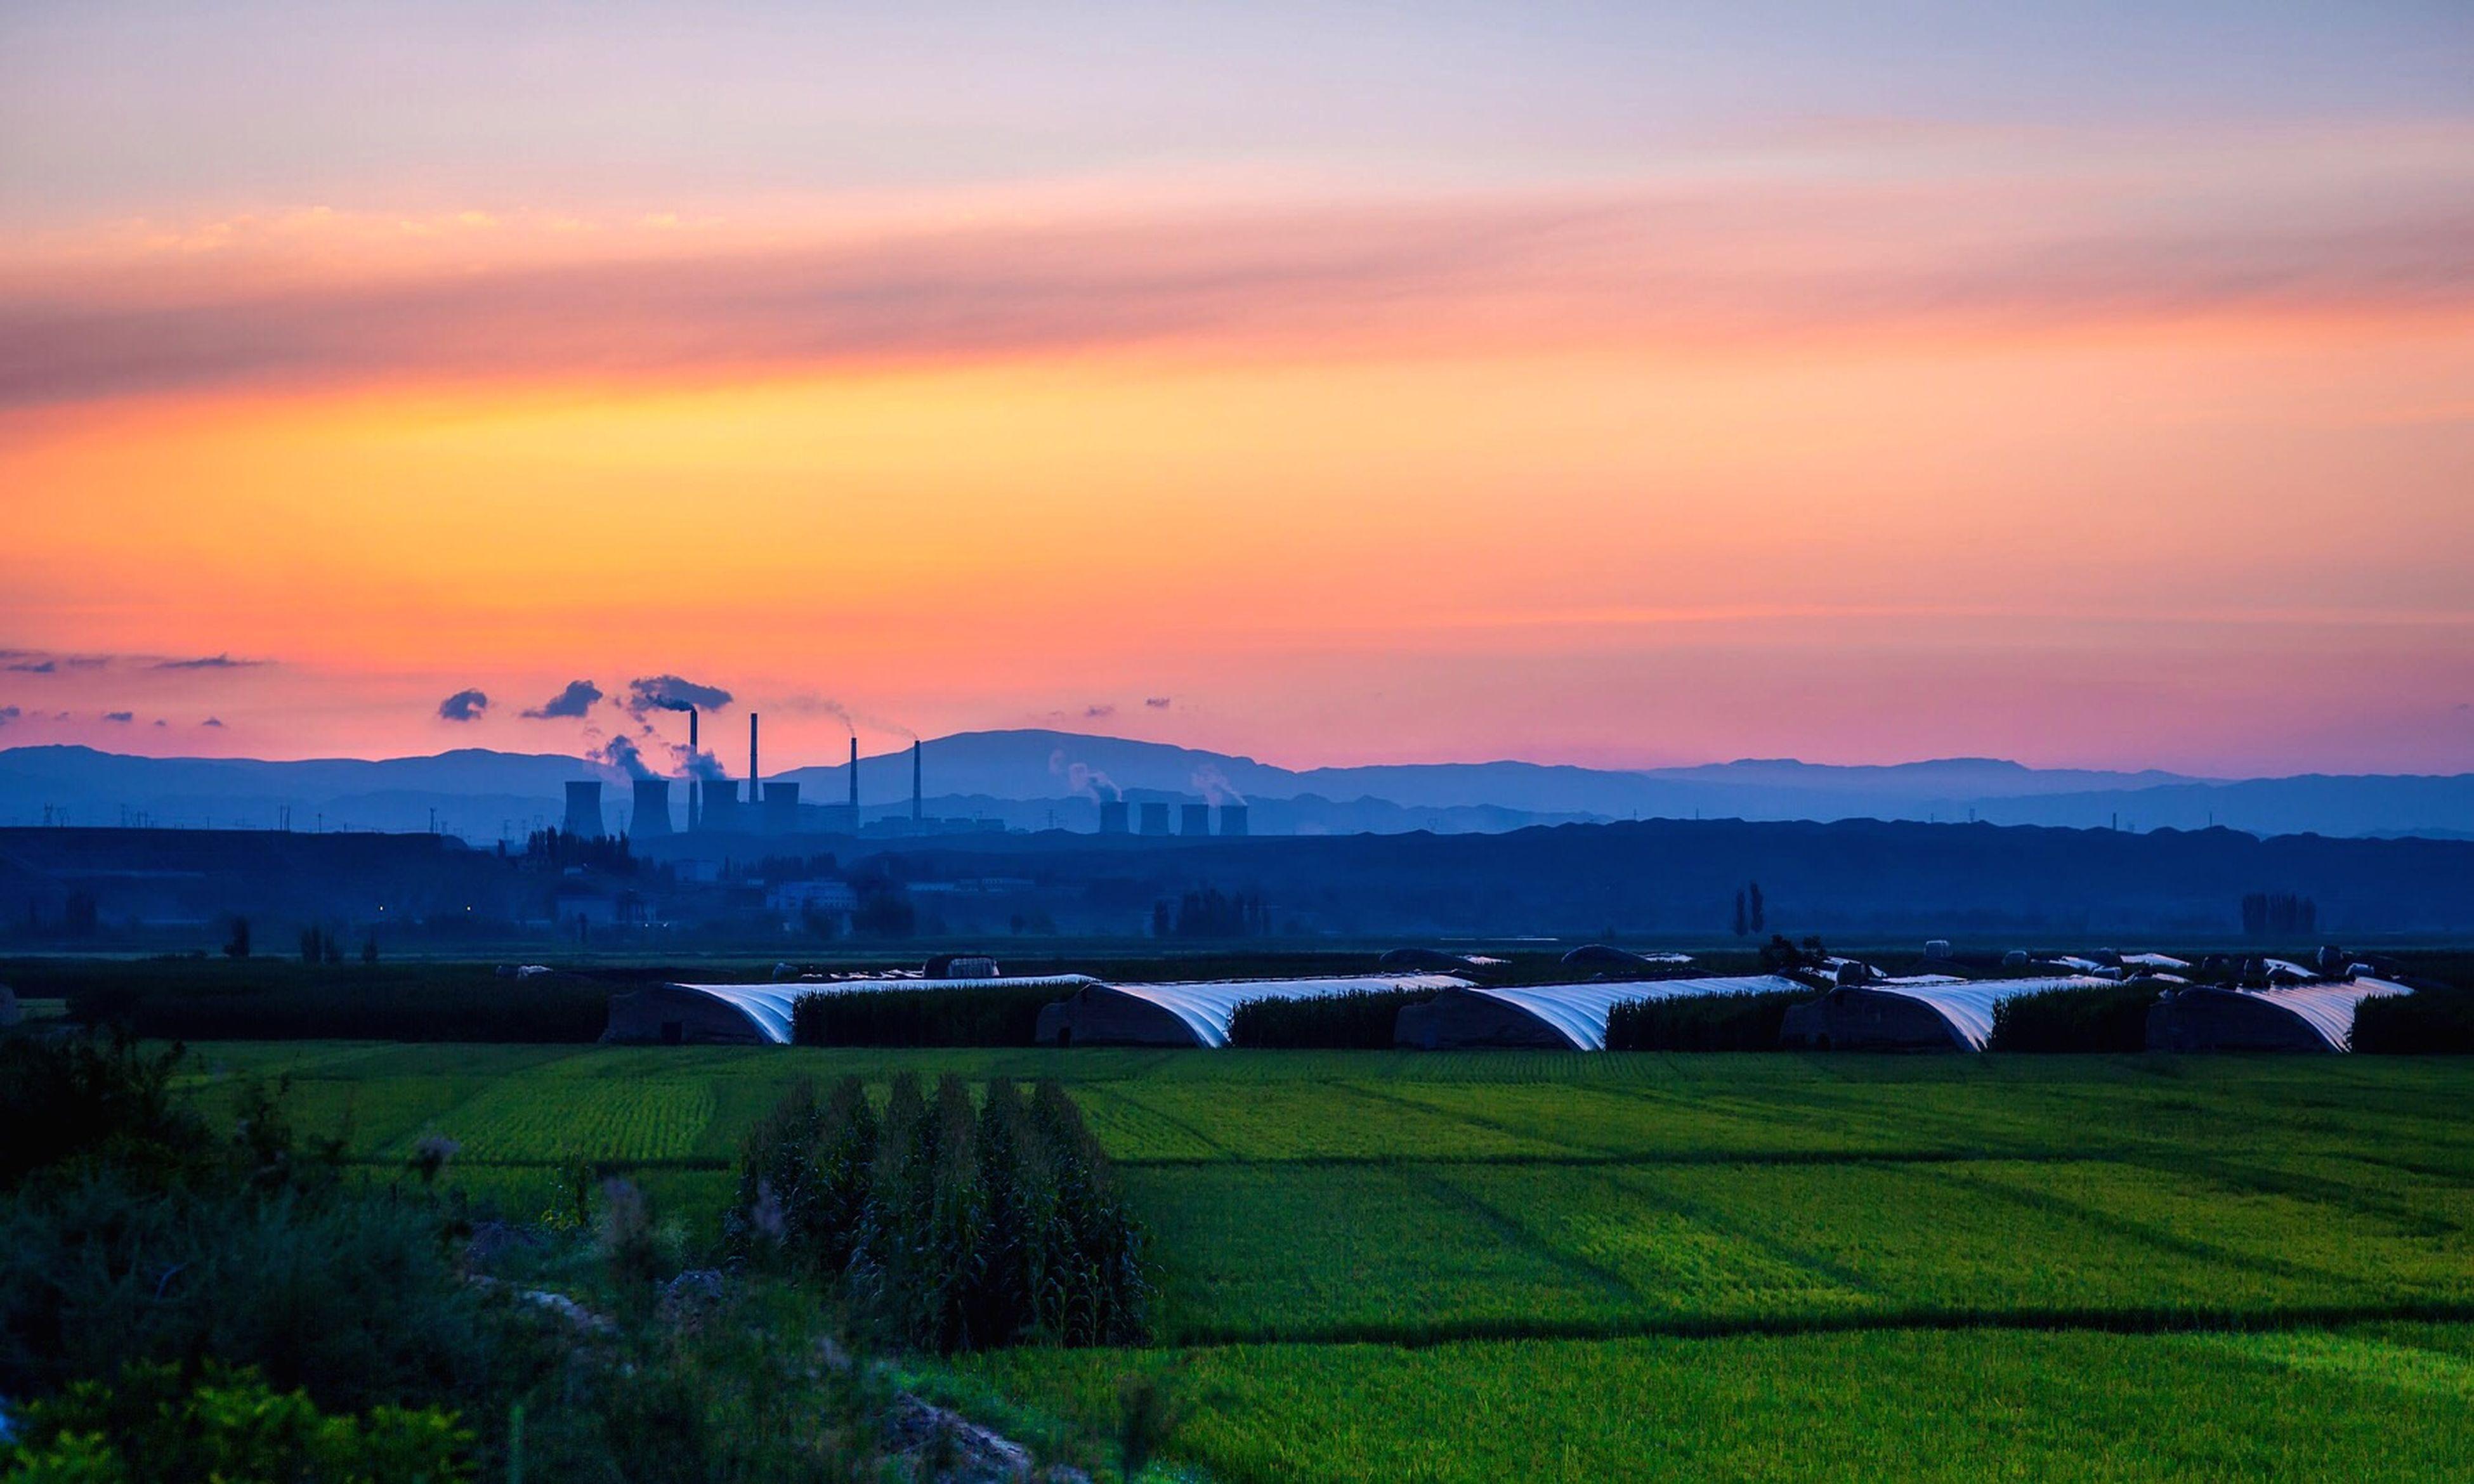 sunset, orange color, sky, mountain, landscape, scenics, field, cloud - sky, beauty in nature, tranquil scene, nature, tranquility, transportation, rural scene, grass, agriculture, mountain range, mode of transport, farm, idyllic